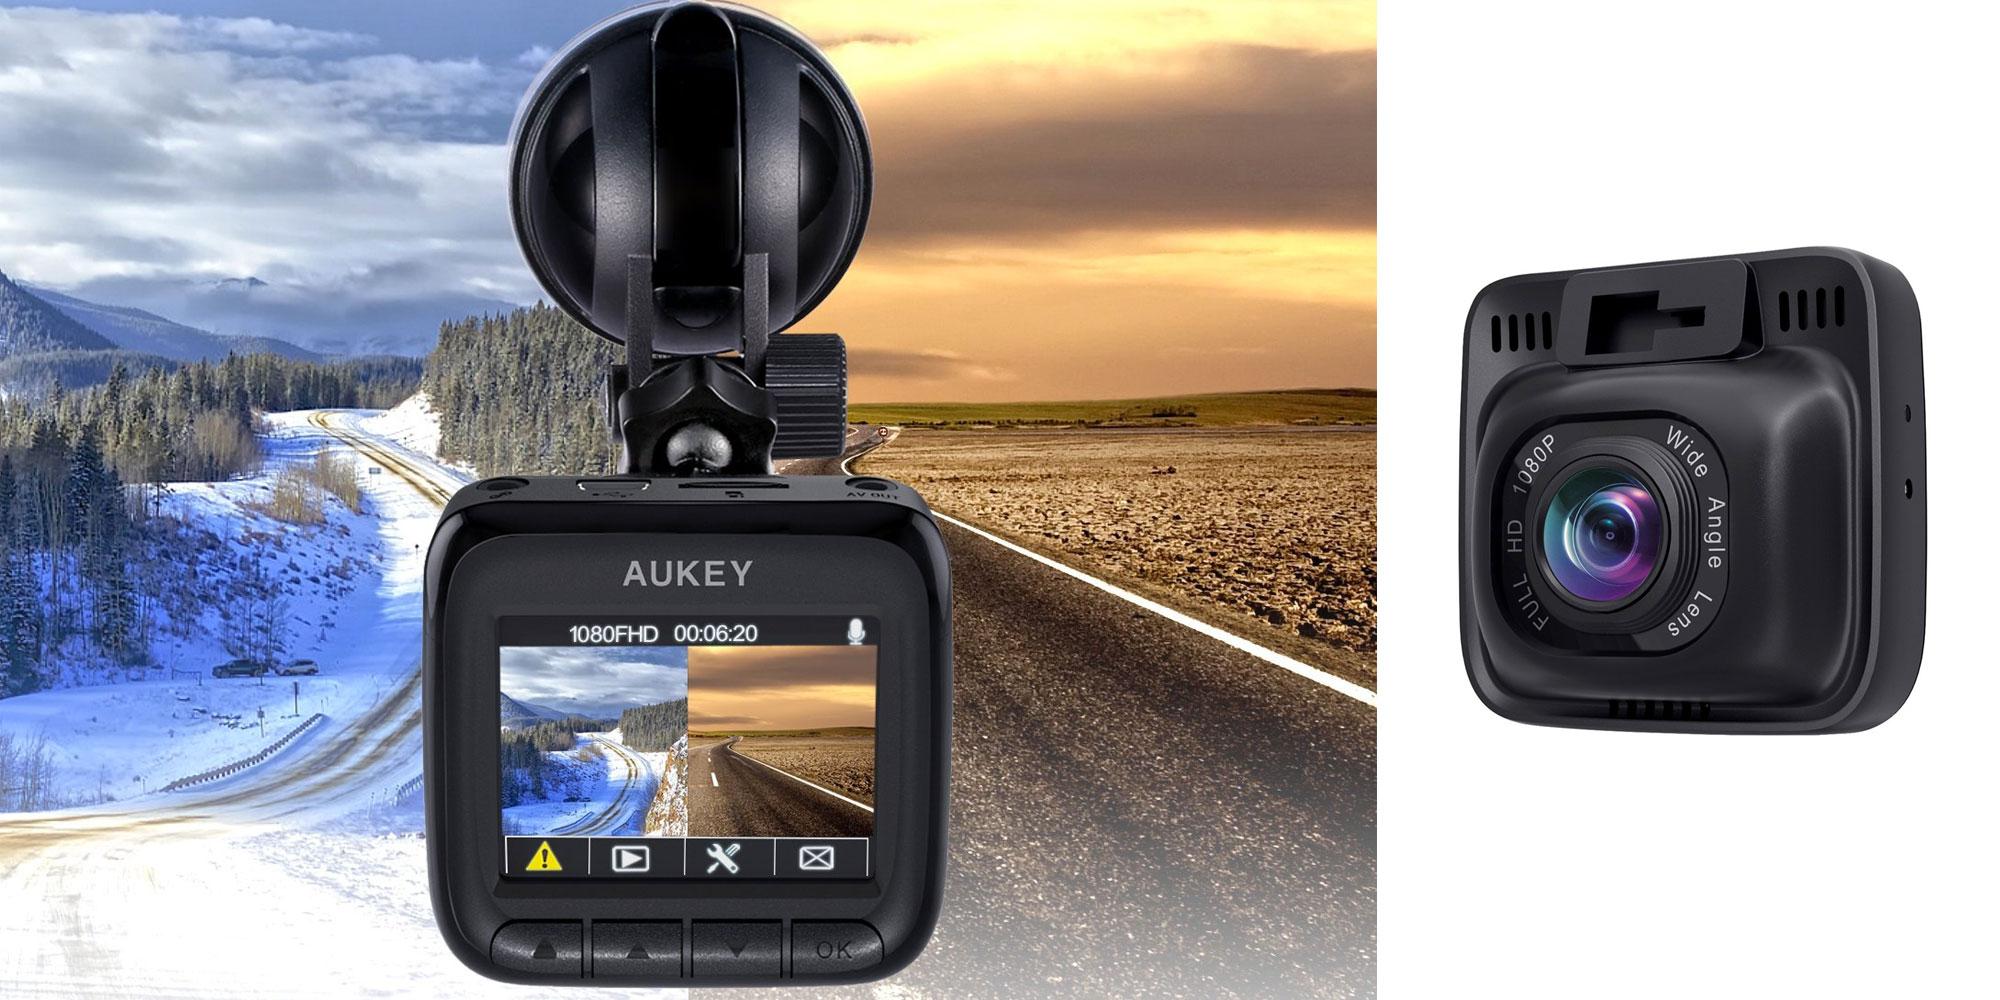 aukey 39 s 6 lane 1080p dash cam keeps track of your drives. Black Bedroom Furniture Sets. Home Design Ideas